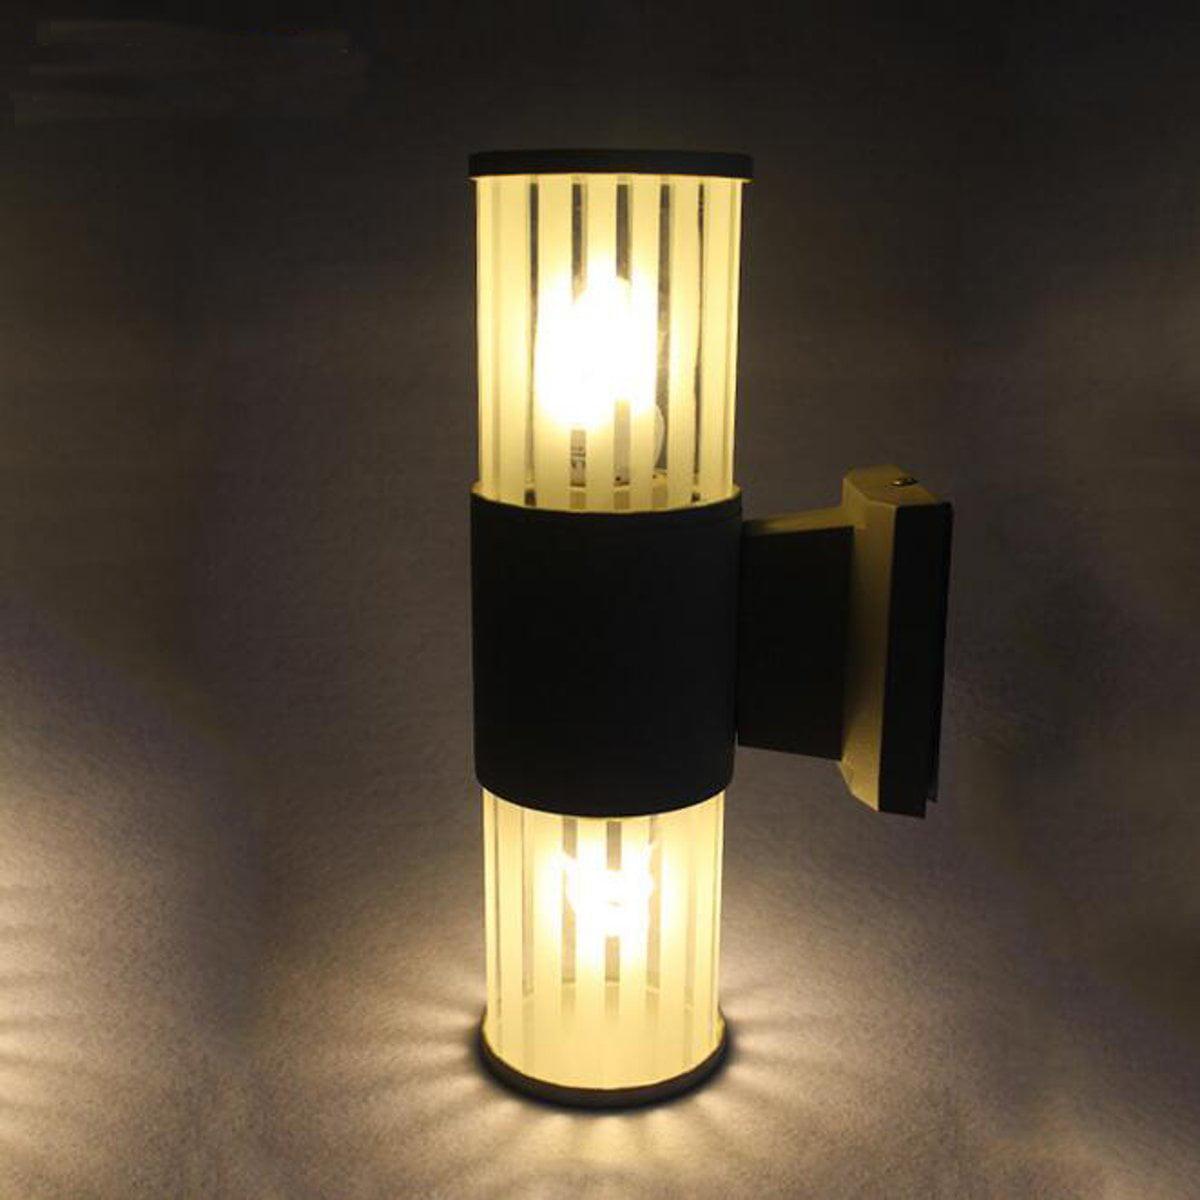 Modern up down led wall light lamp indoor outdoor sconce lighting lamp fixture for living room hallway bedroom lamps walmart com